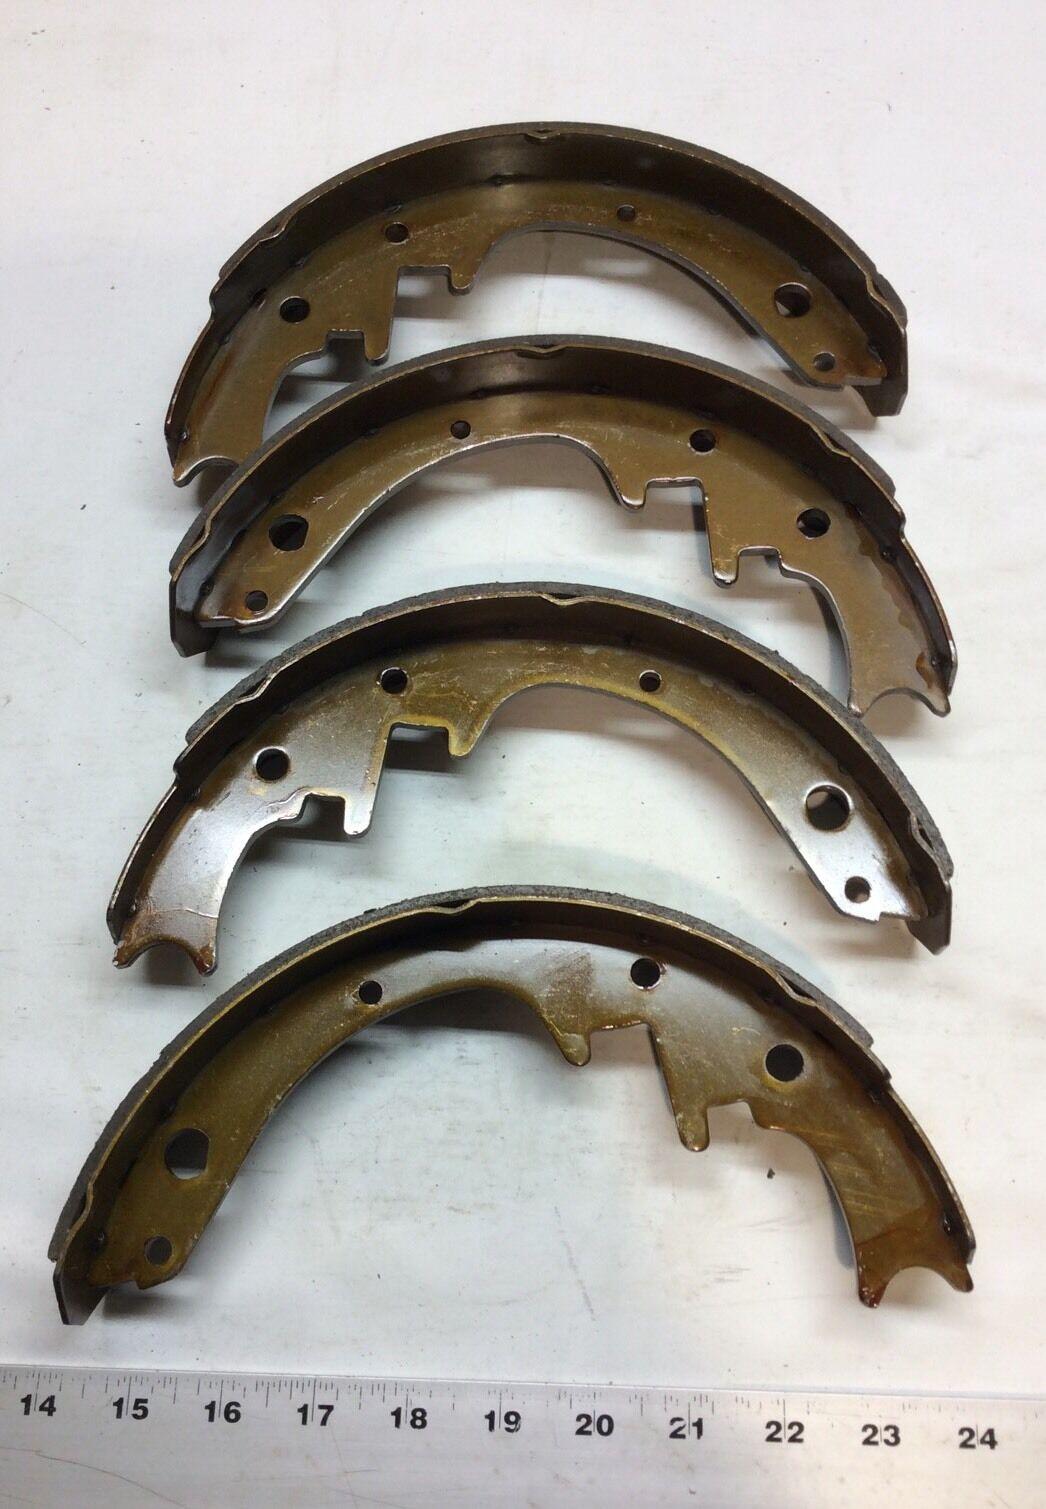 Forklift parts accessories heavy equipment parts accs 840182 clark 4 shoe set sku 11162308c fandeluxe Choice Image